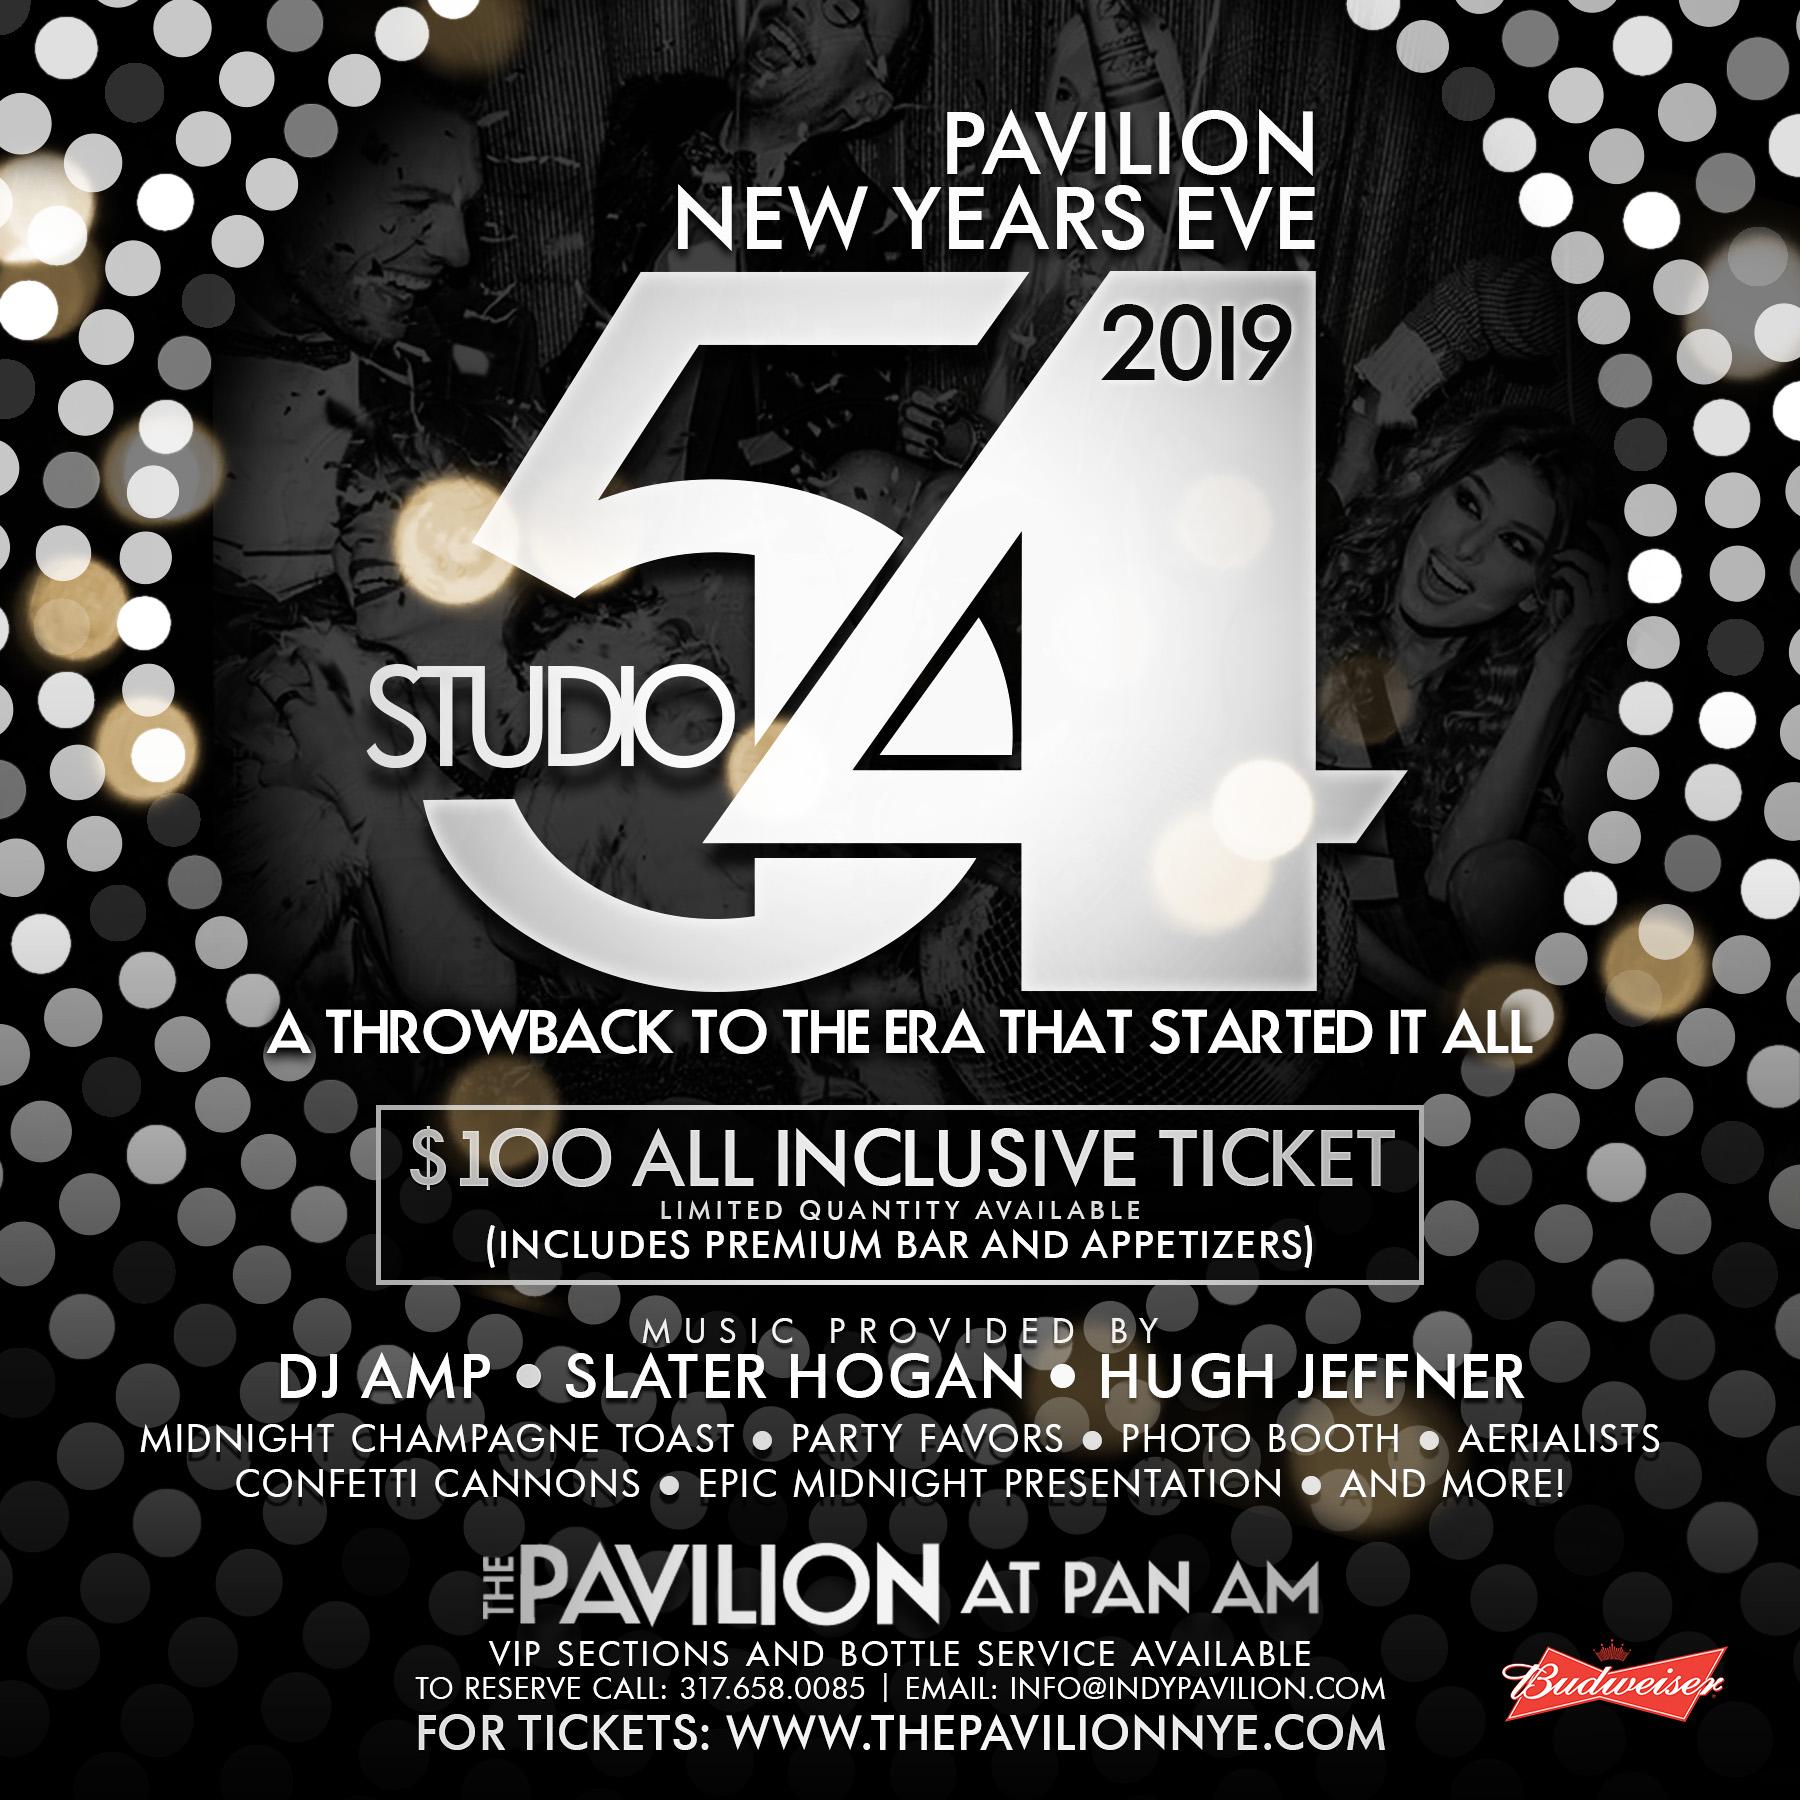 Pan Am Studio 54